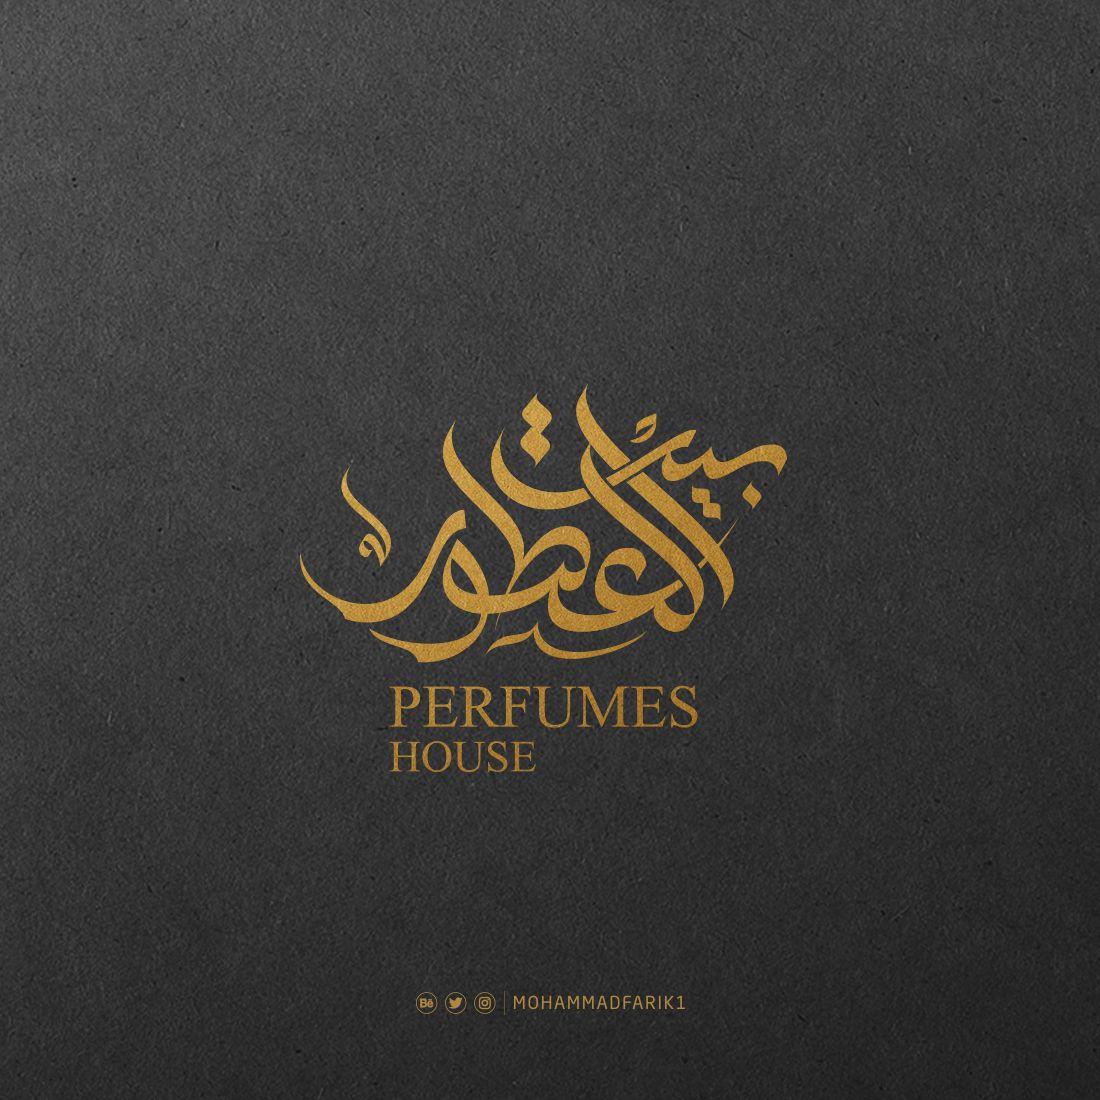 Perfumes House Logo In Arabic Calligraphy By Mohammad Farik